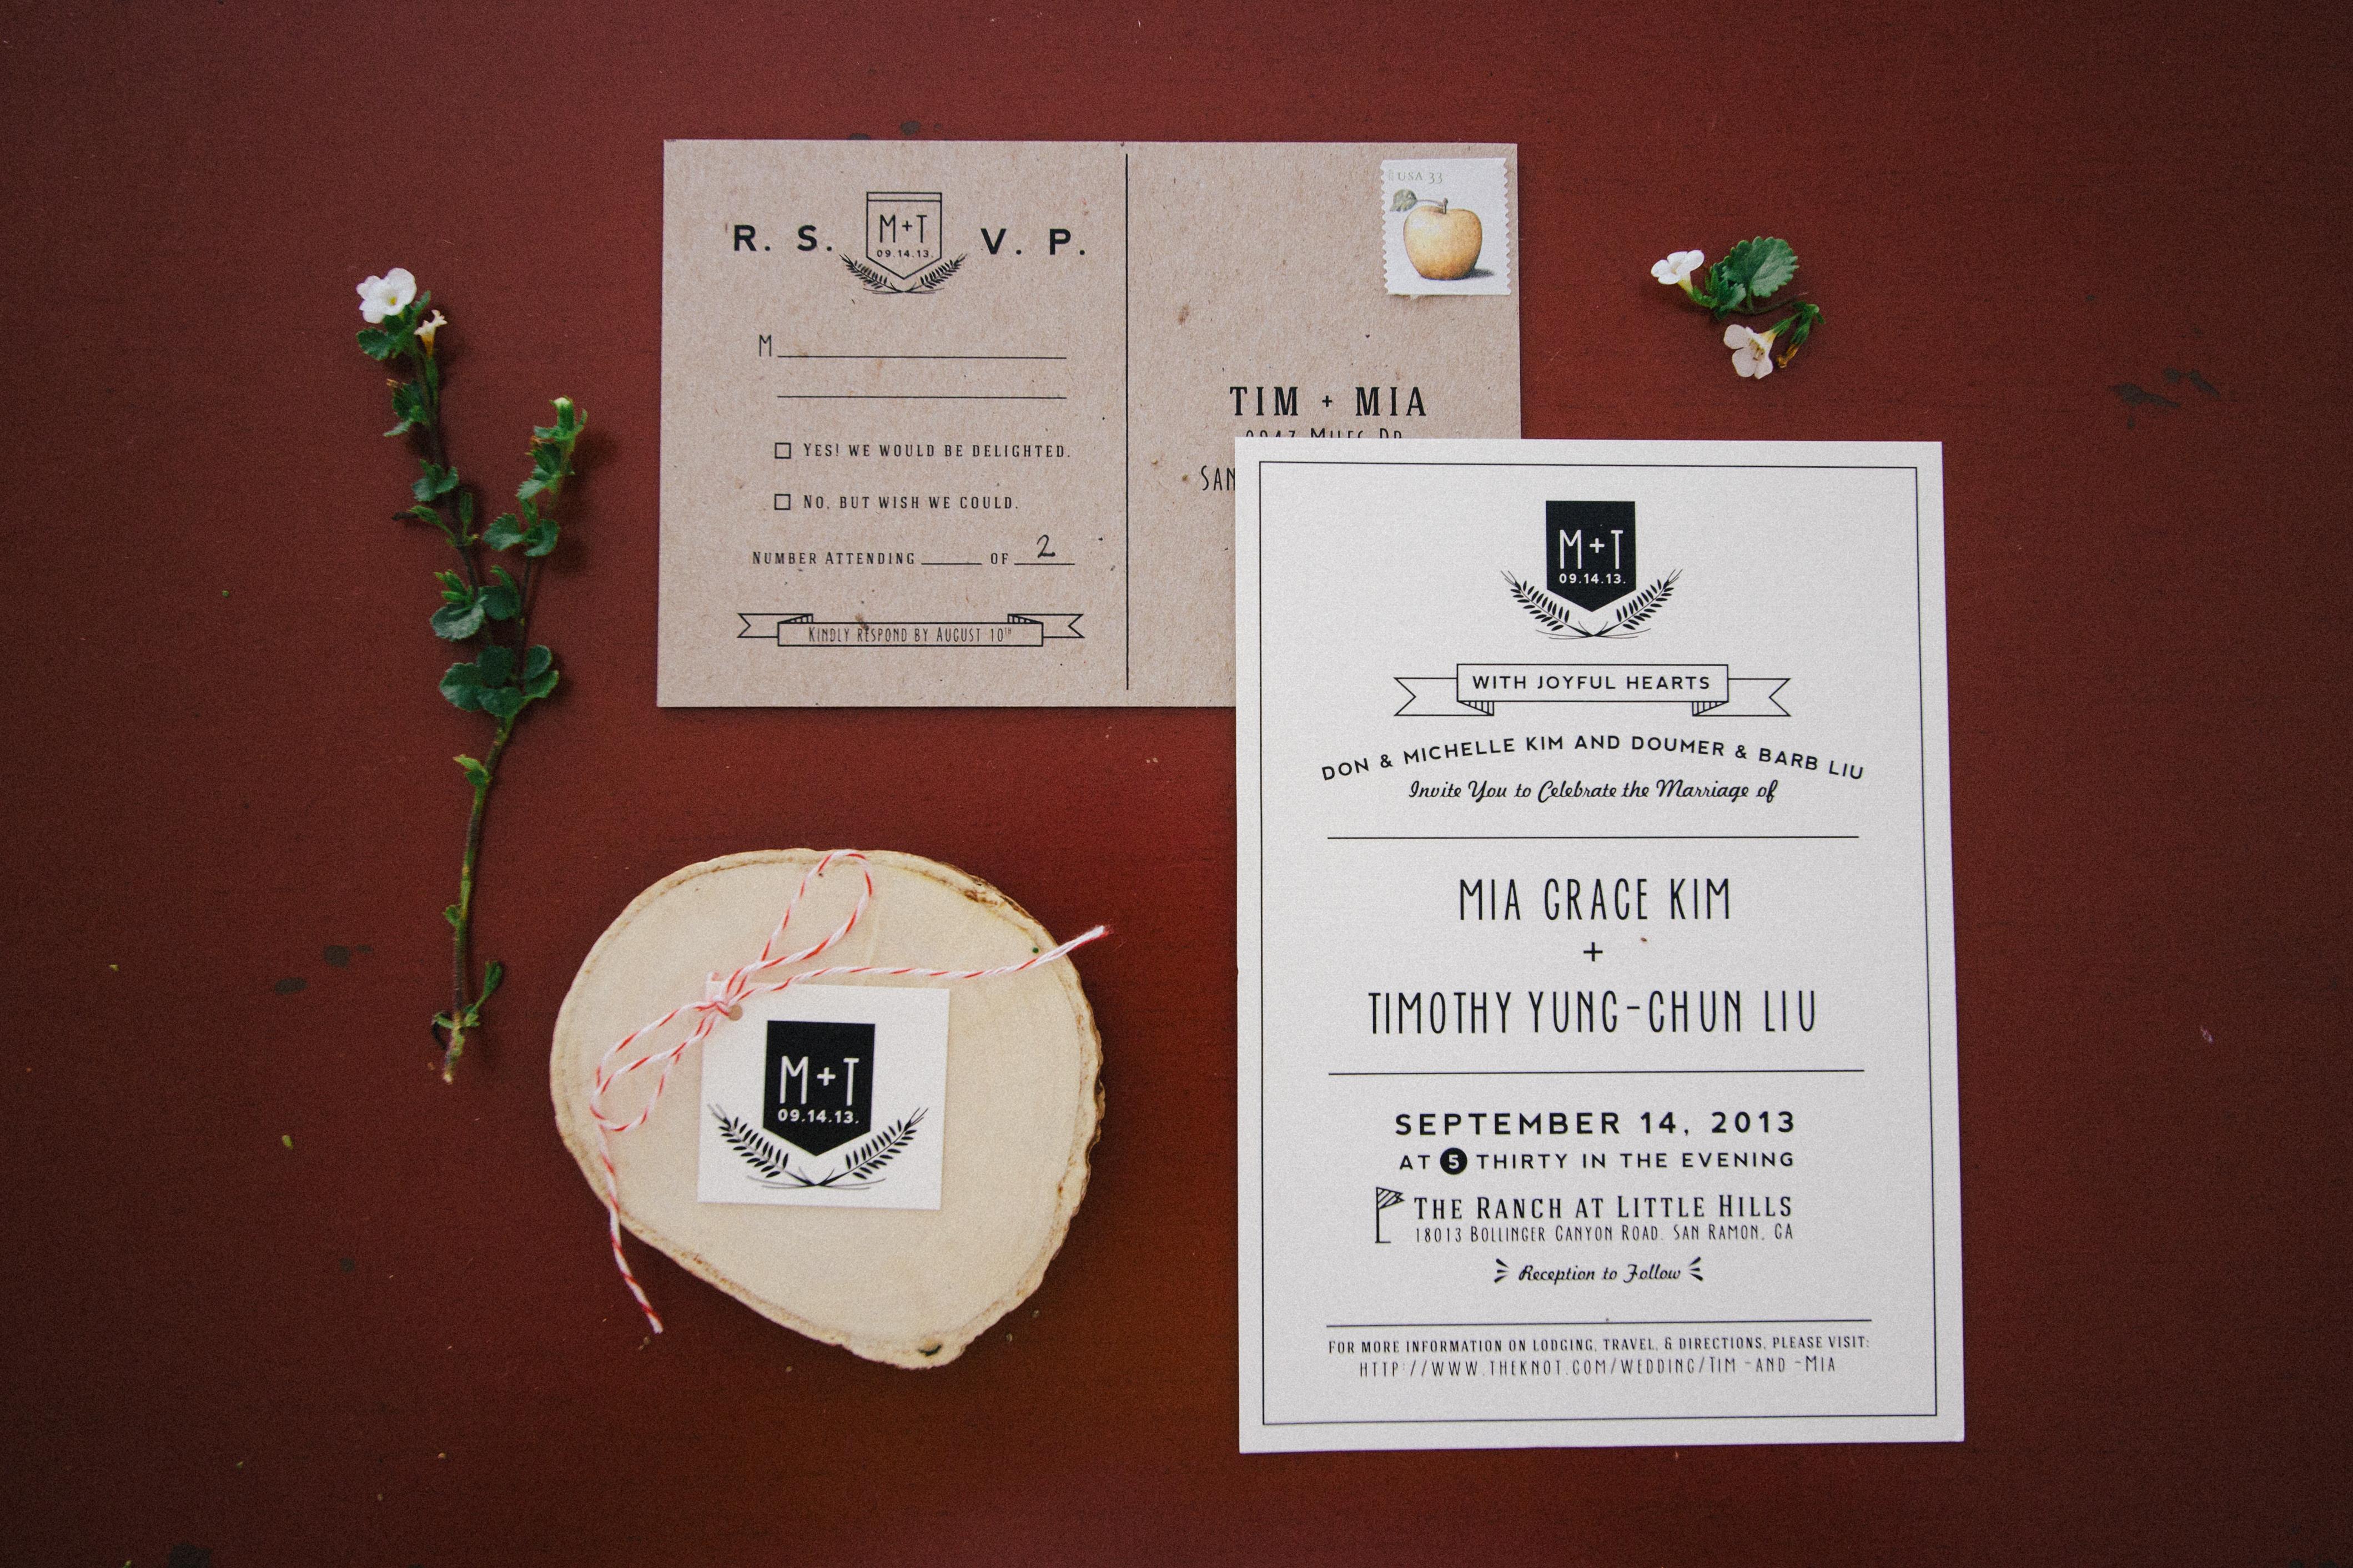 Mia + Tim Wedding Invitations! - Irenekly